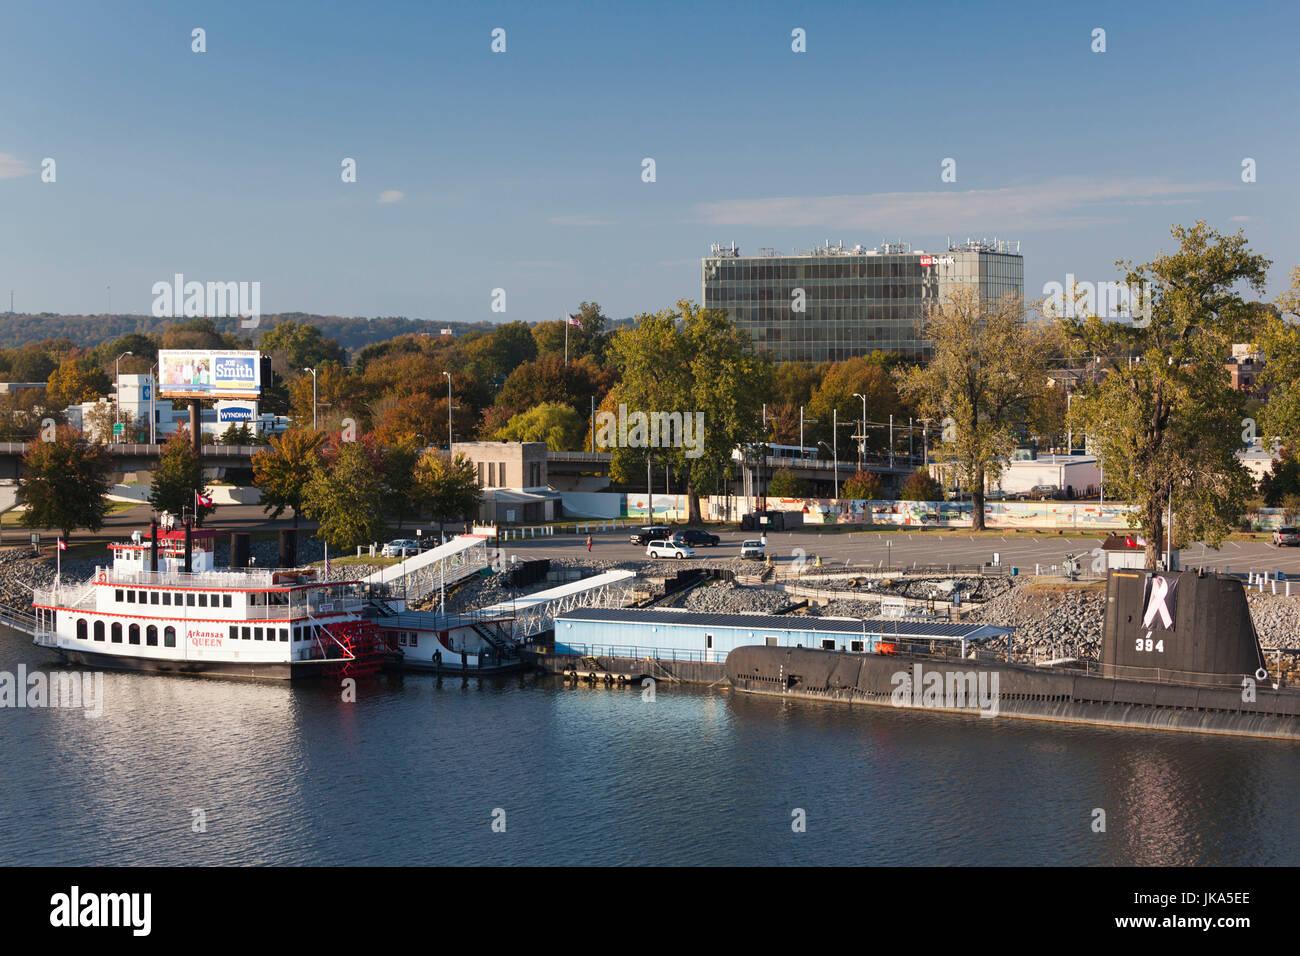 USA, Arkansas, North Little Rock, Arkansas Inland Maritime Museum and USS Razorback submarine - Stock Image